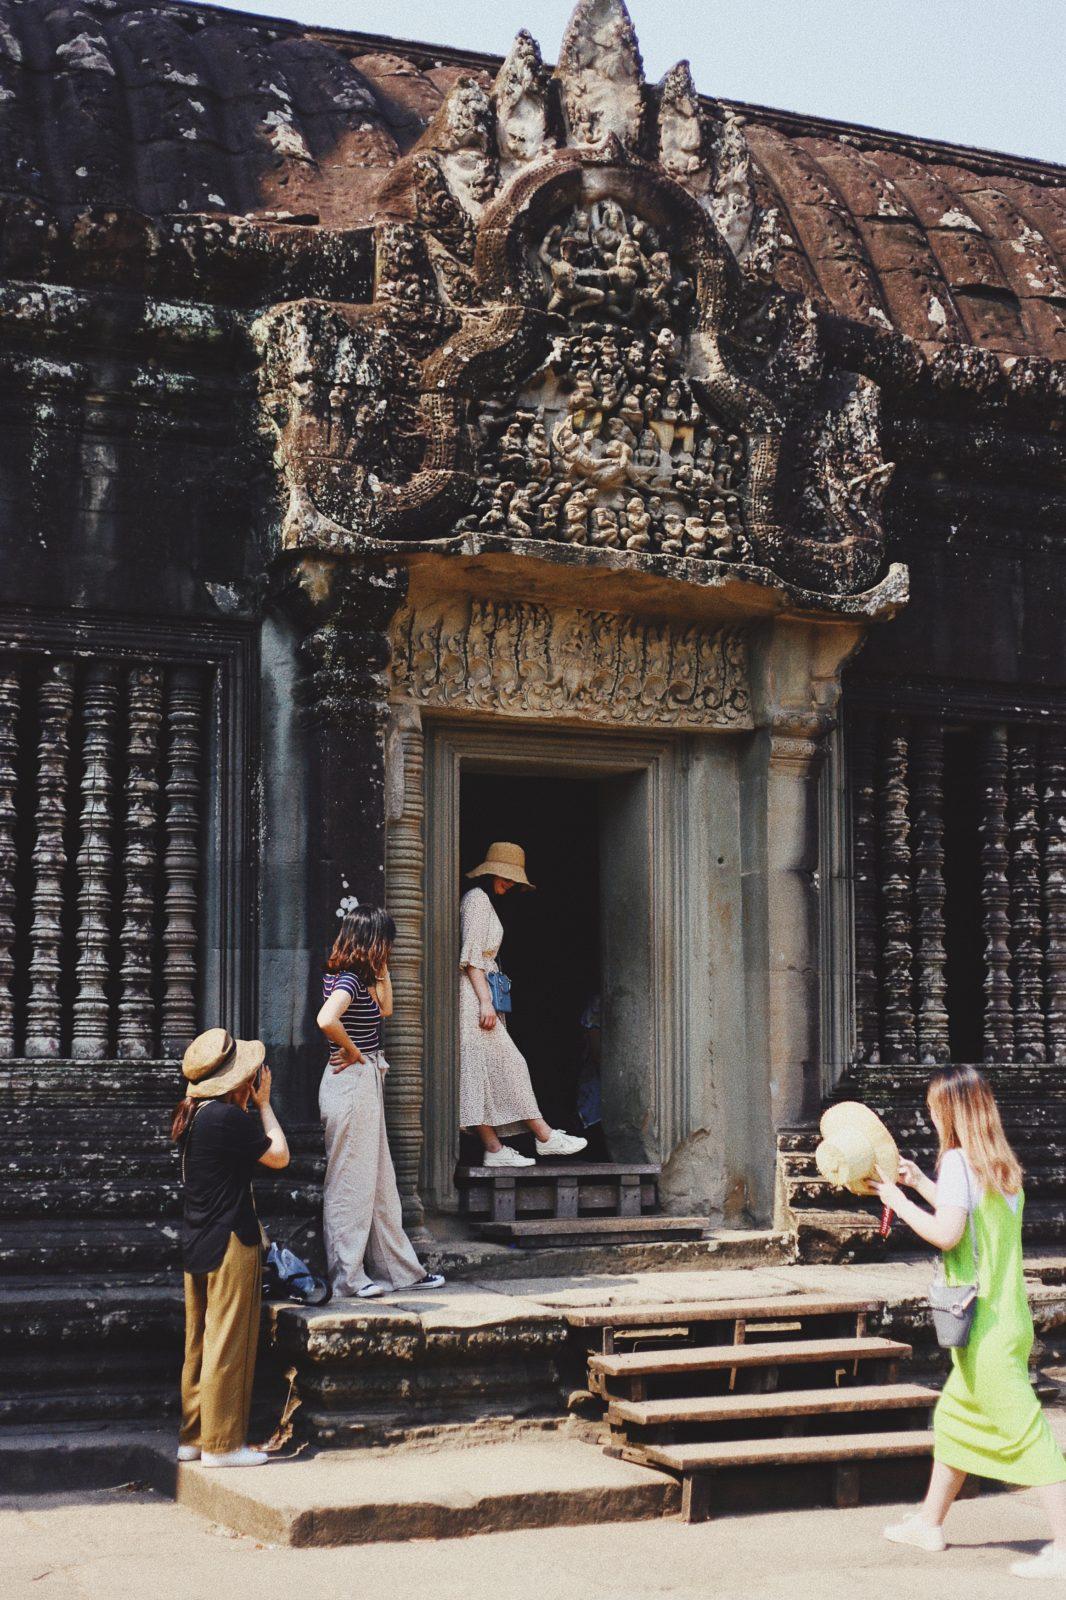 виза в камбоджу для граждан рф